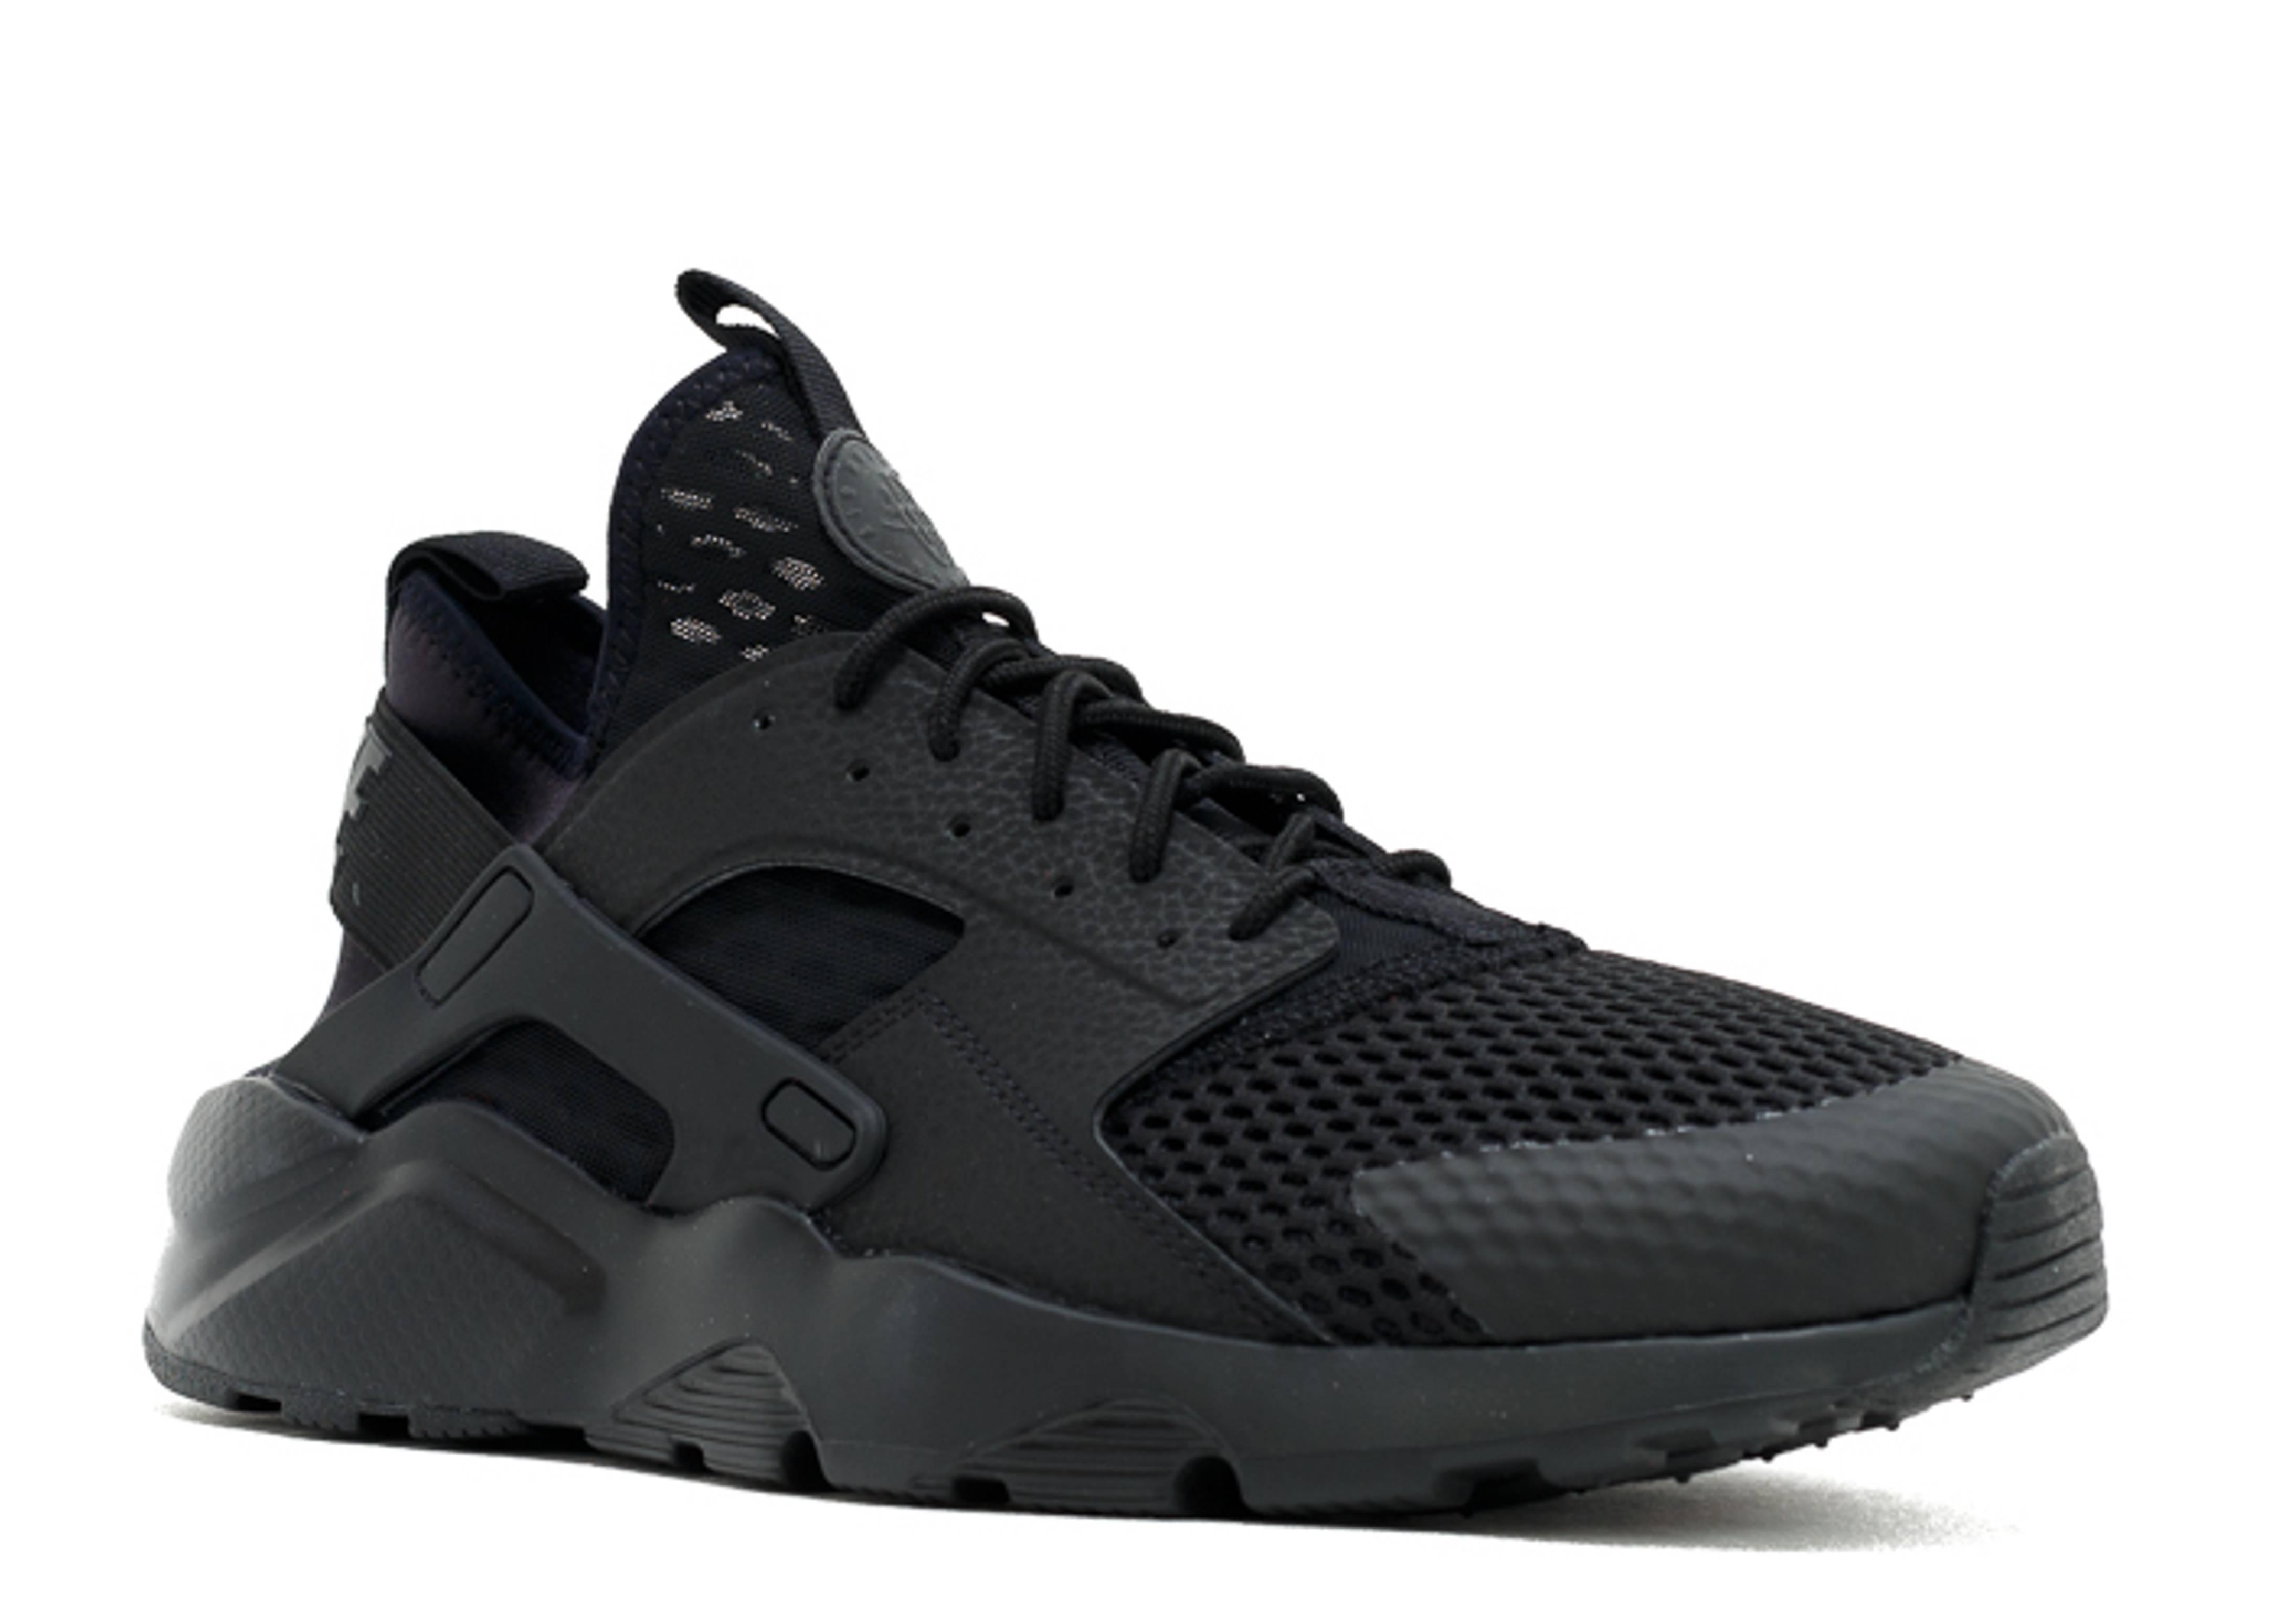 Air Huarache Run Ultra Breathe 'Black' - Nike - 833147 001 - black ...